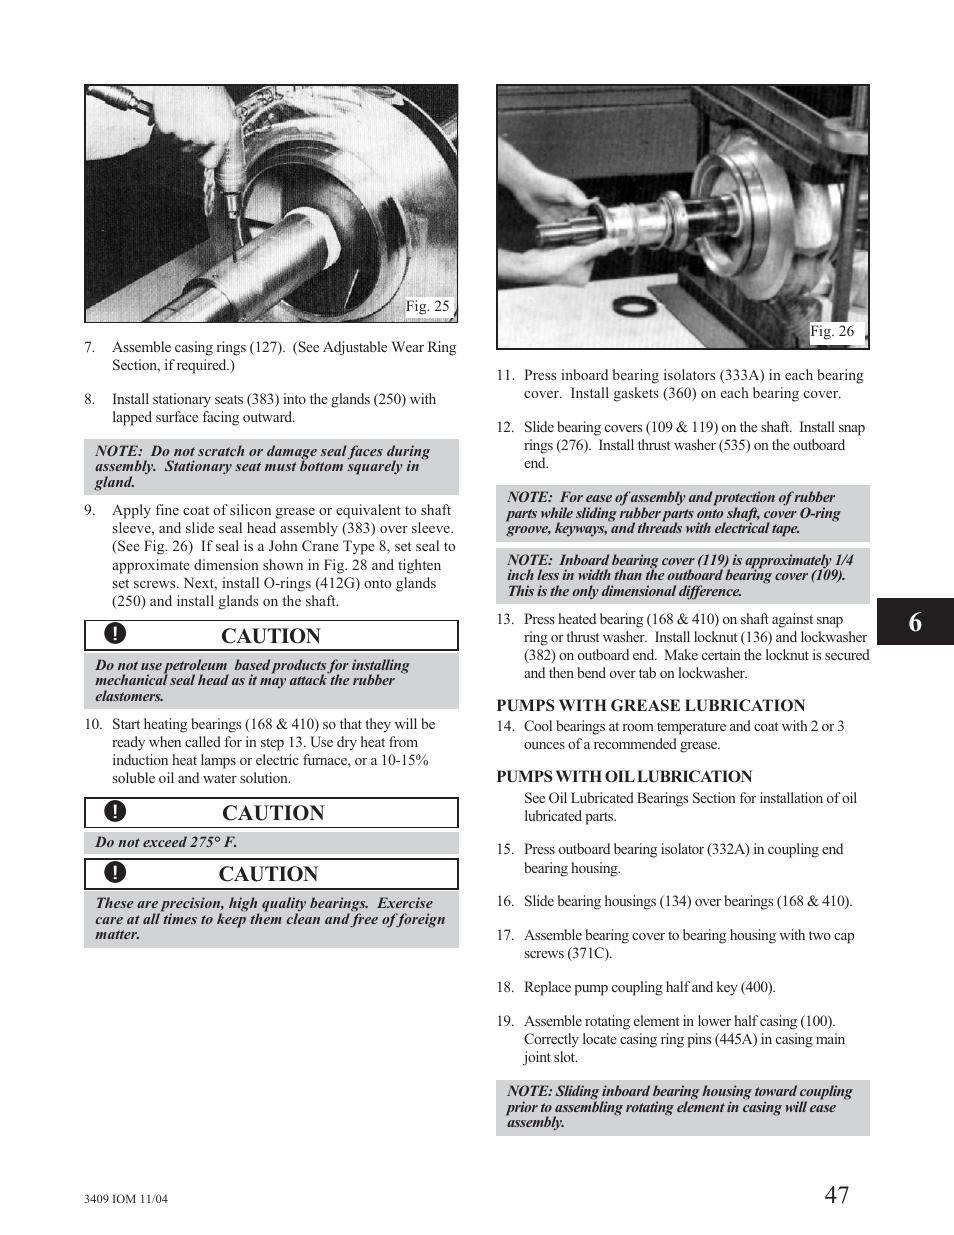 Caution | Goulds Pumps 3409 - IOM User Manual | Page 47 / 68